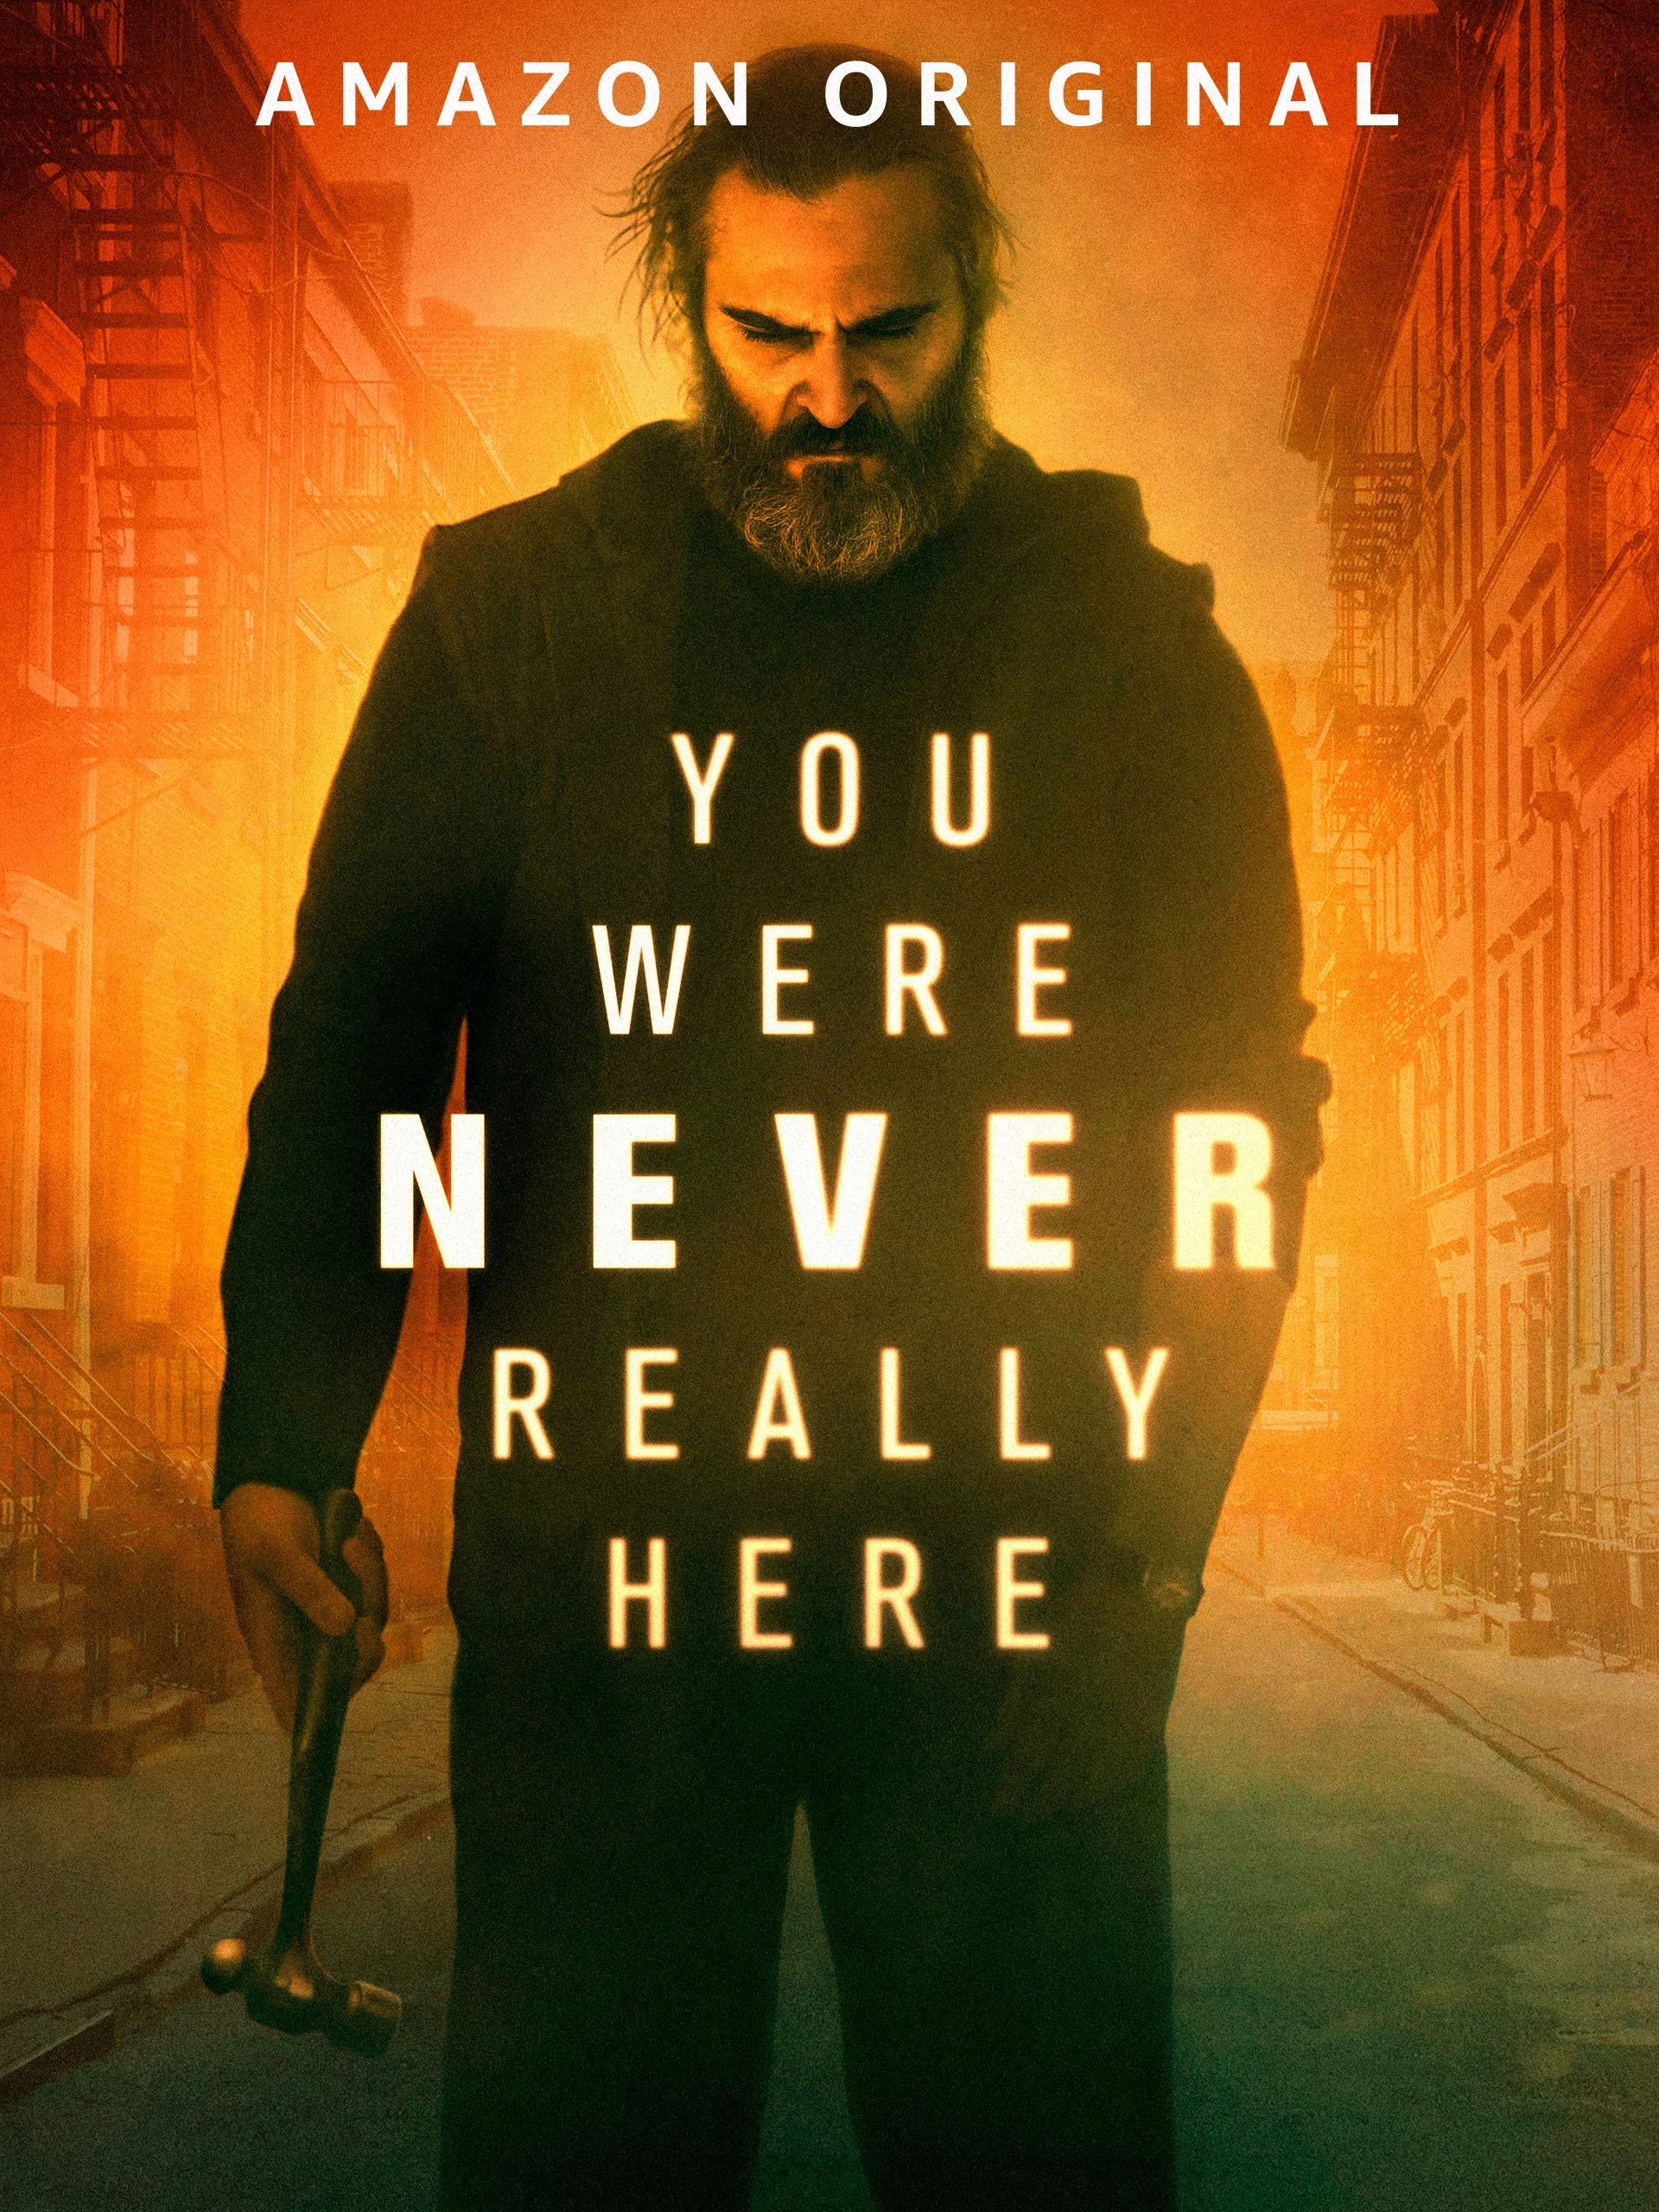 Amazon.com: You Were Never Really Here: Joaquin Phoenix, Ekaterina ...